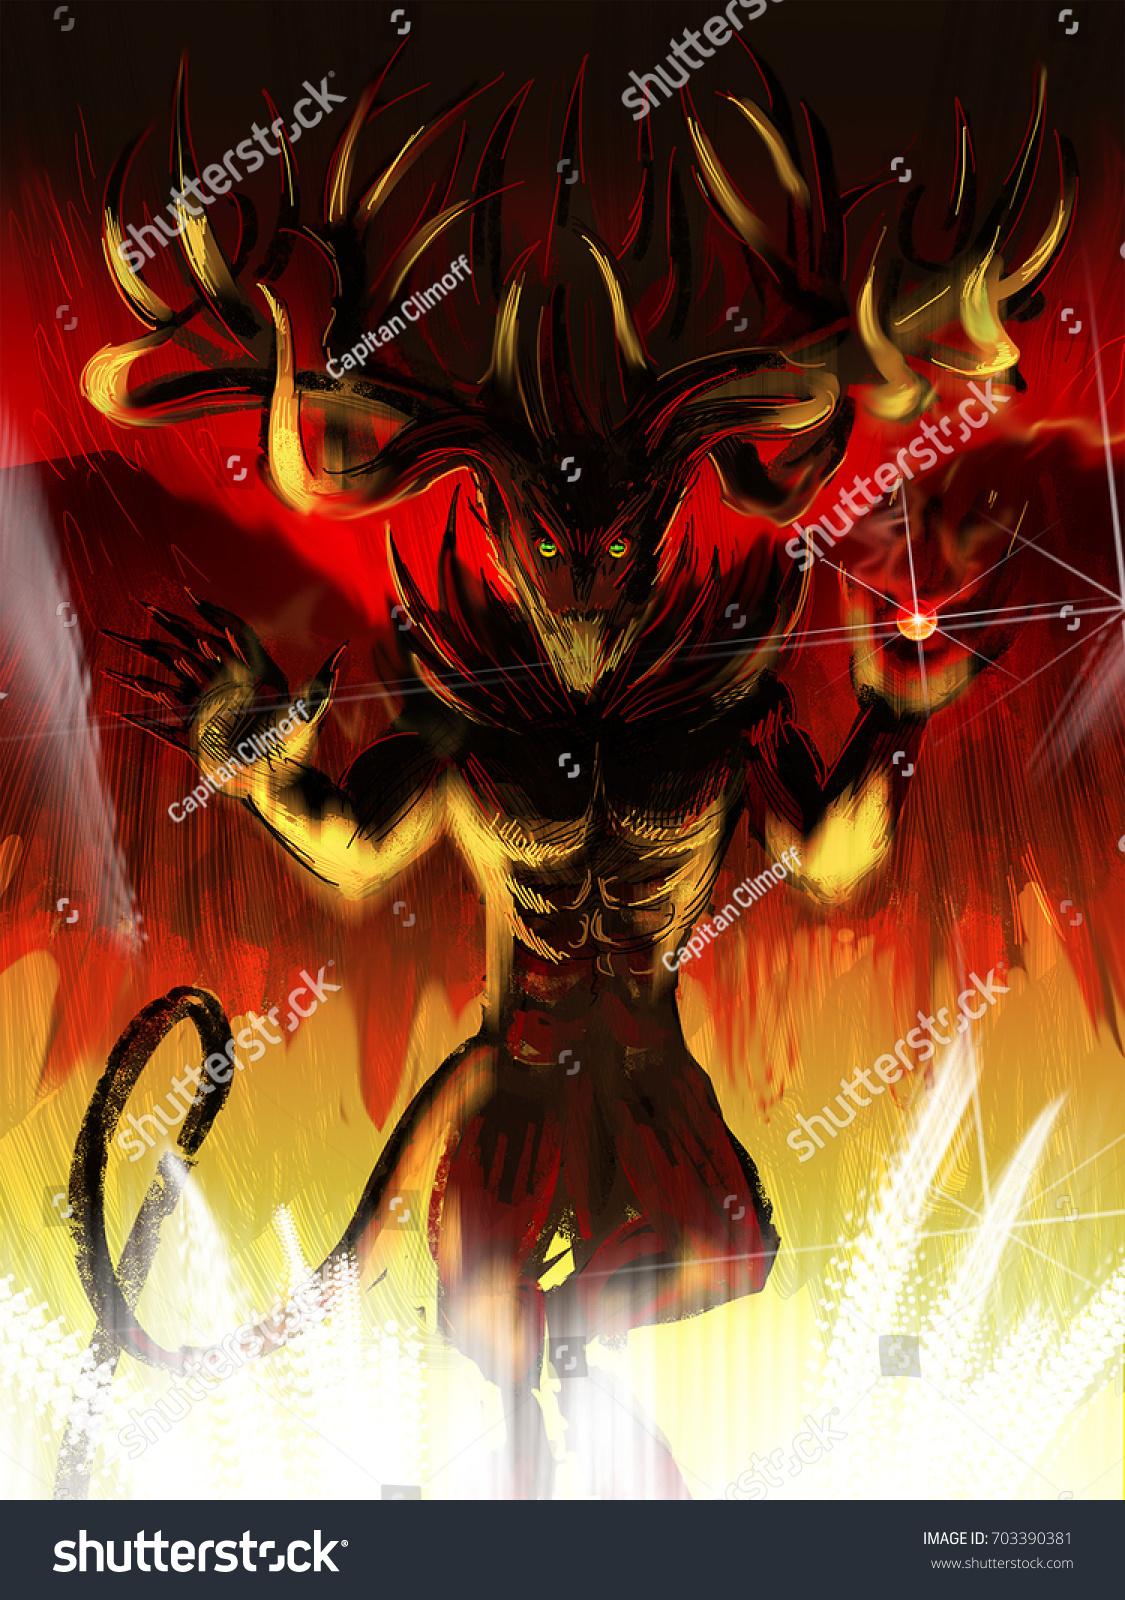 Demon hell poster background fire rock stock illustration 703390381 demon in hell poster background fire rock death metal mystique voltagebd Images